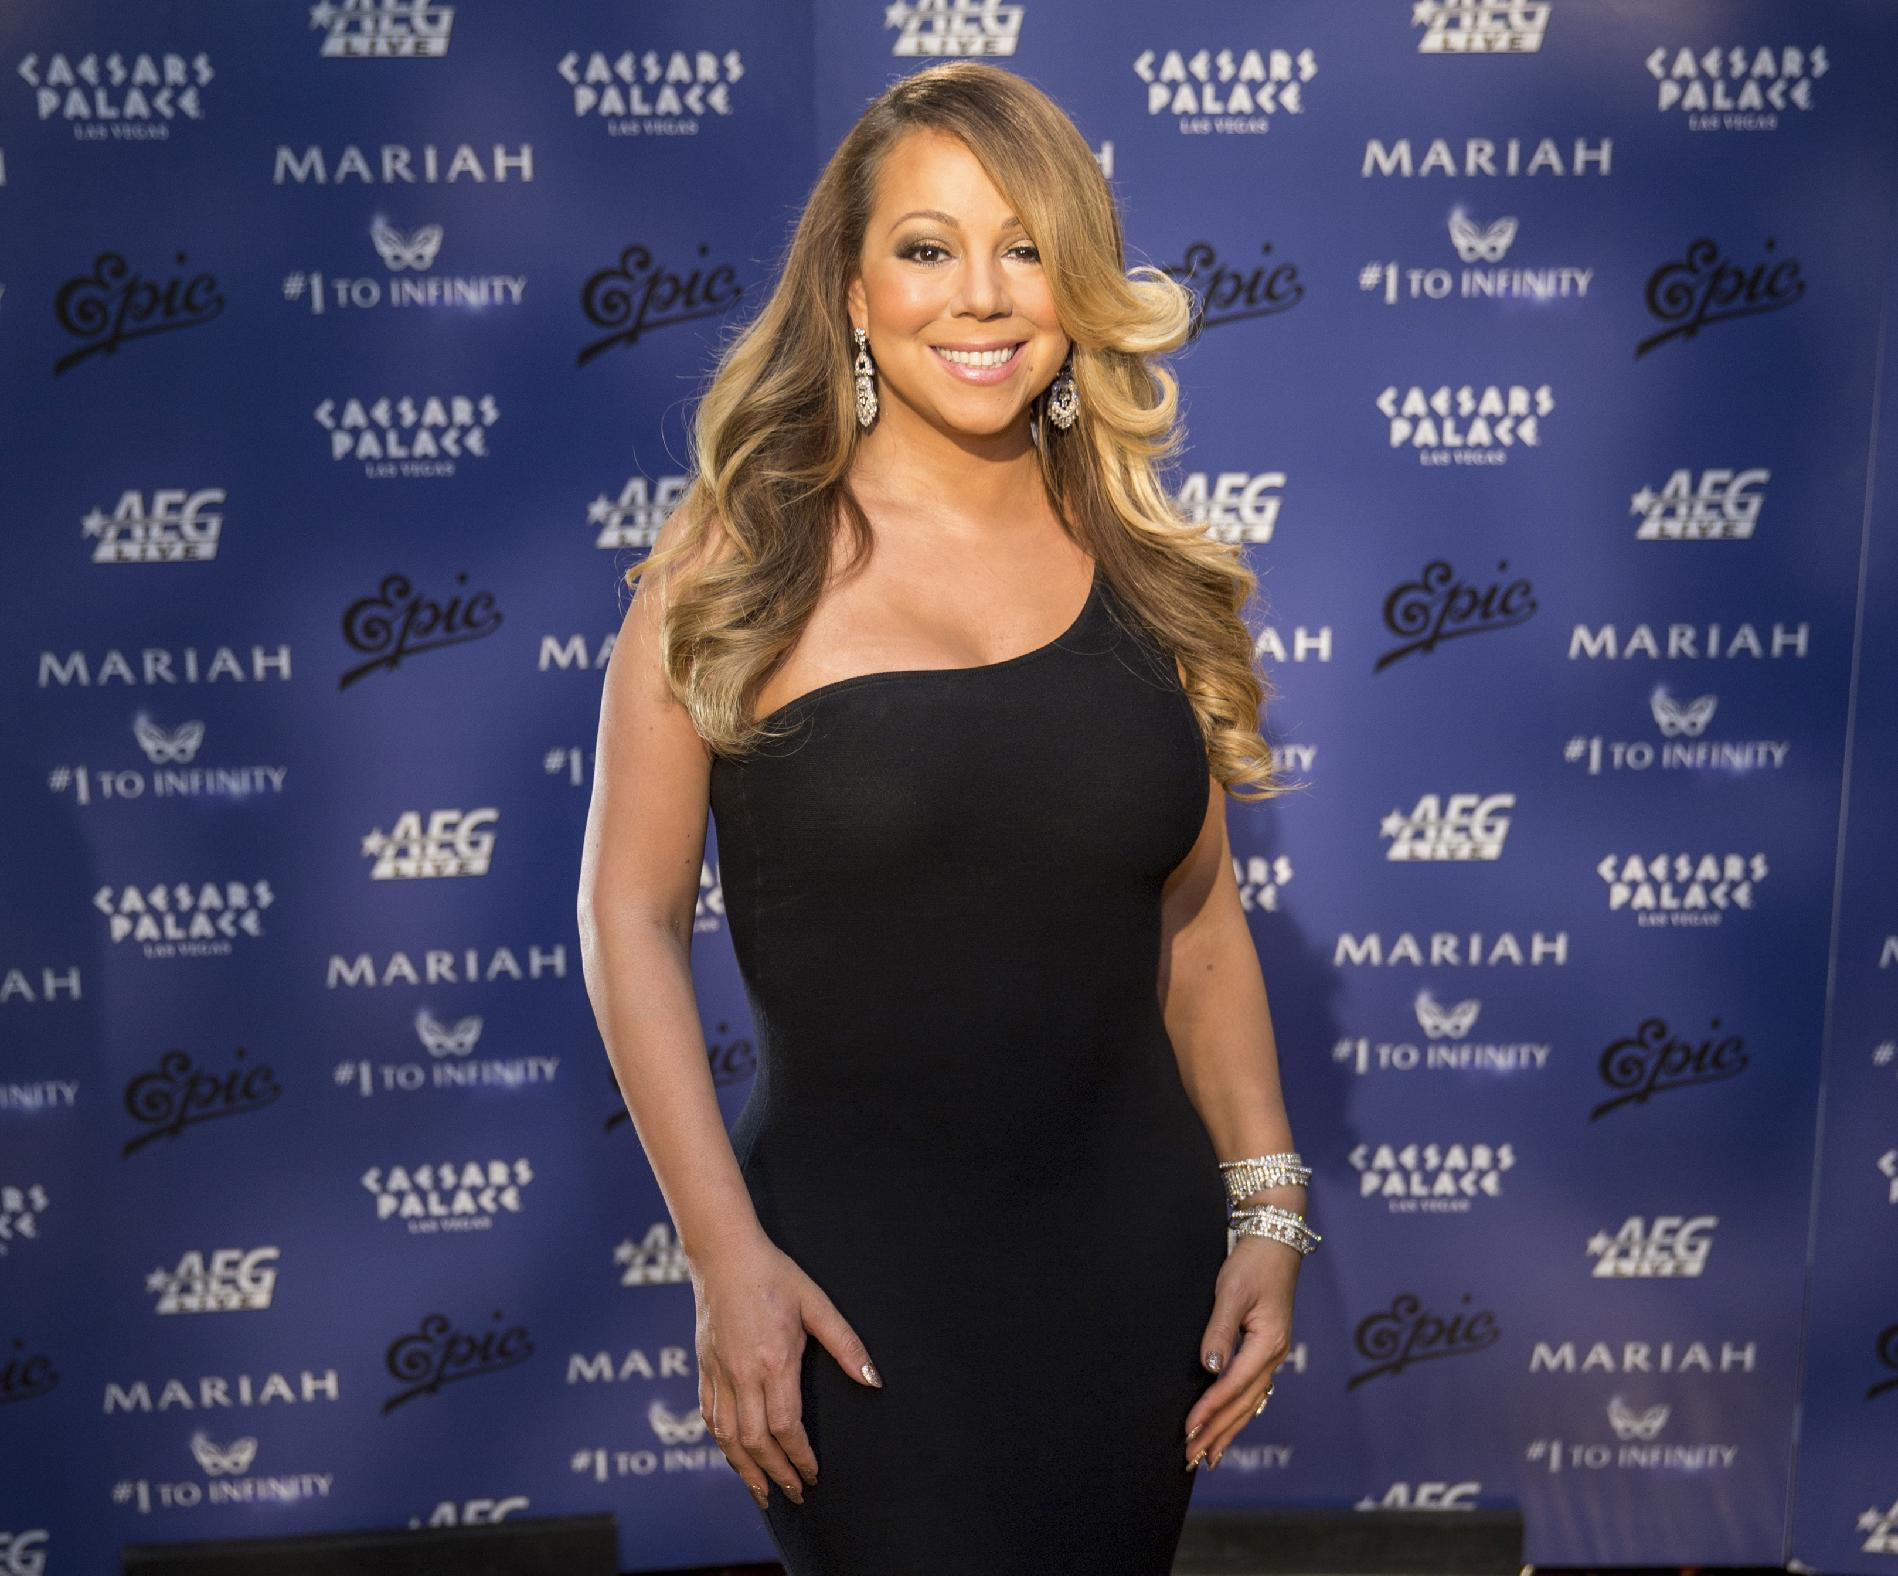 Mariah Carey to sing at Billboard awards after 17-year break